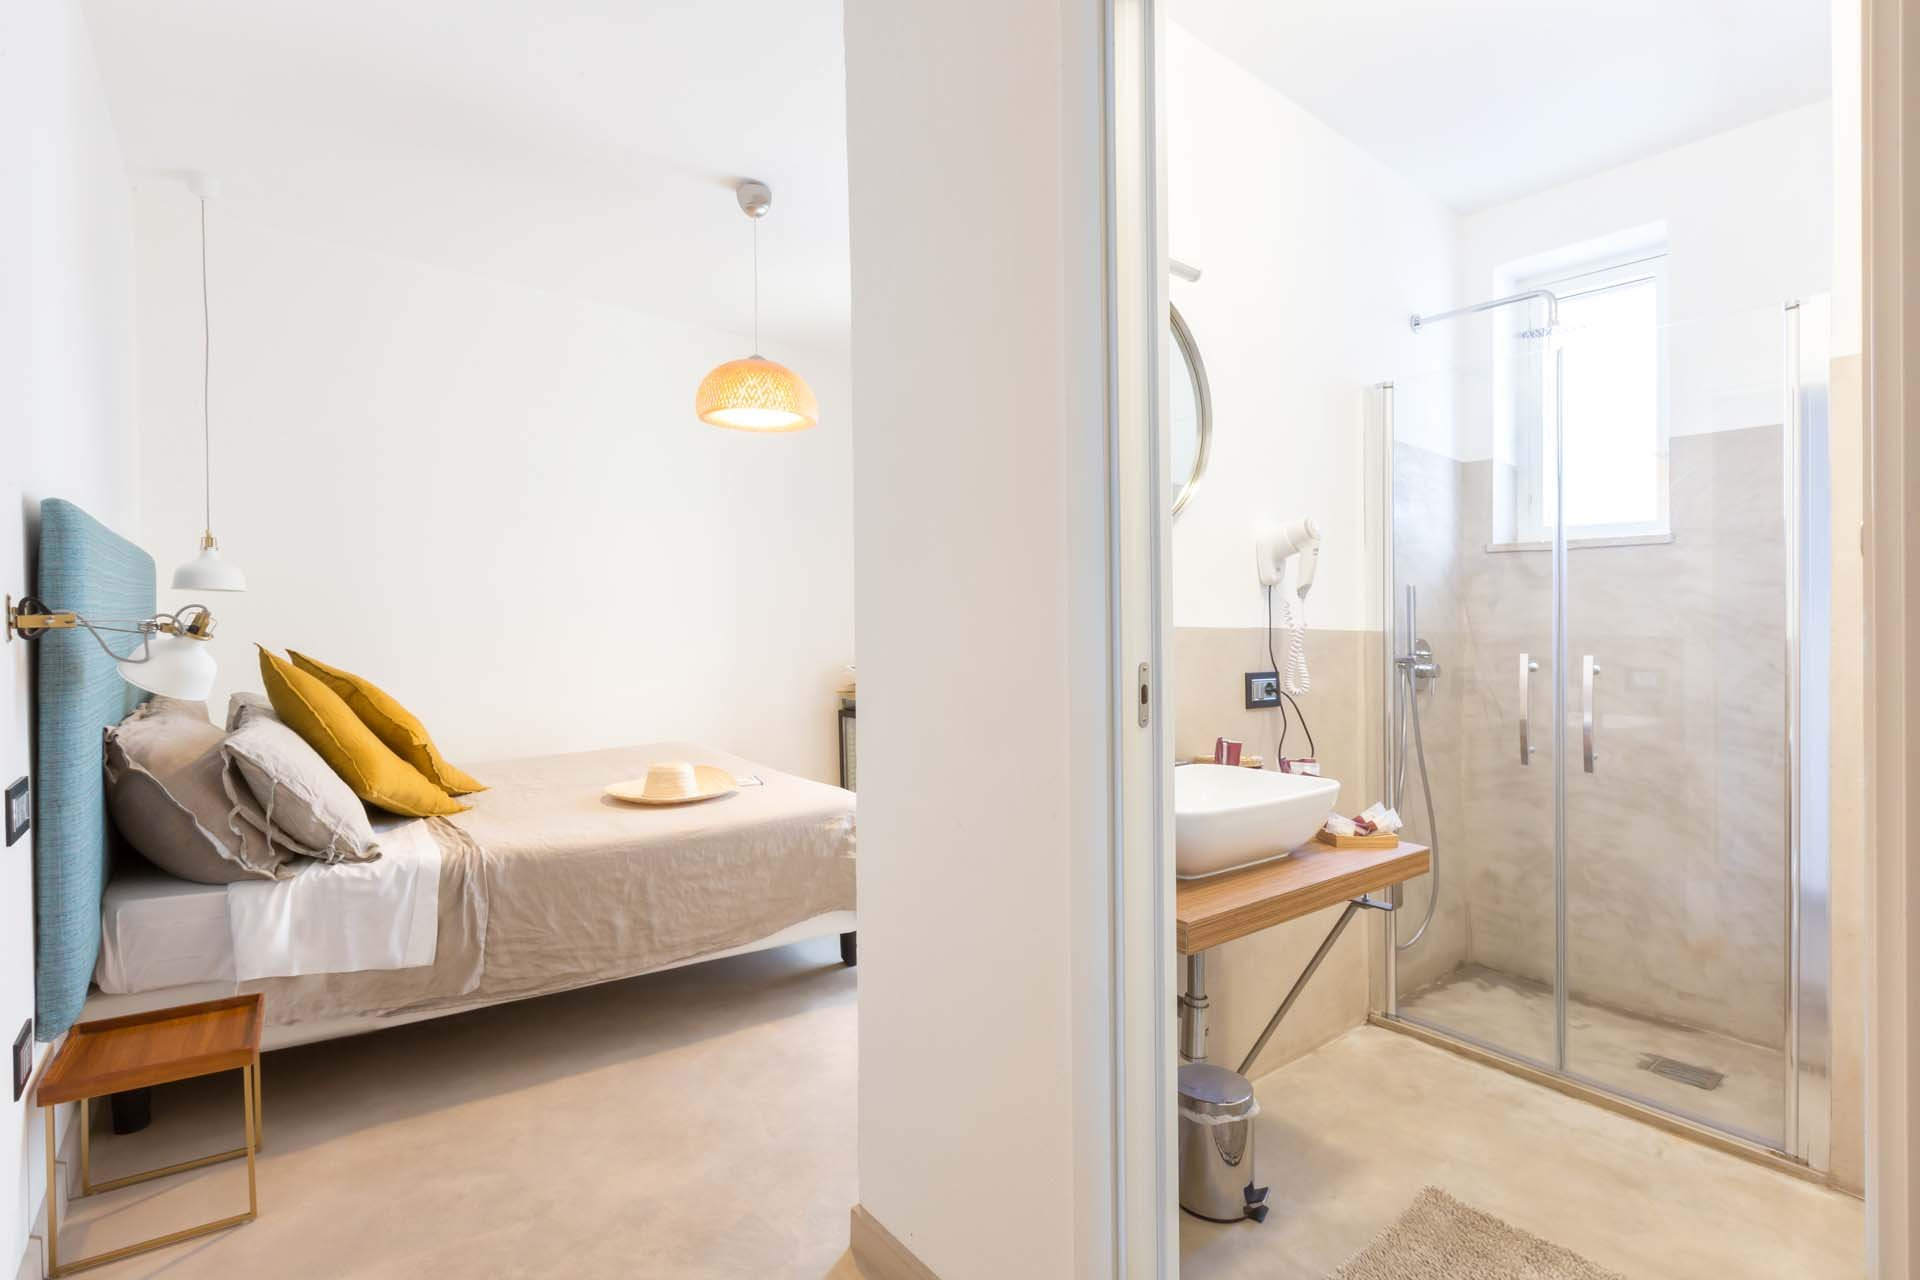 Mediterranean Suites in Sorrento